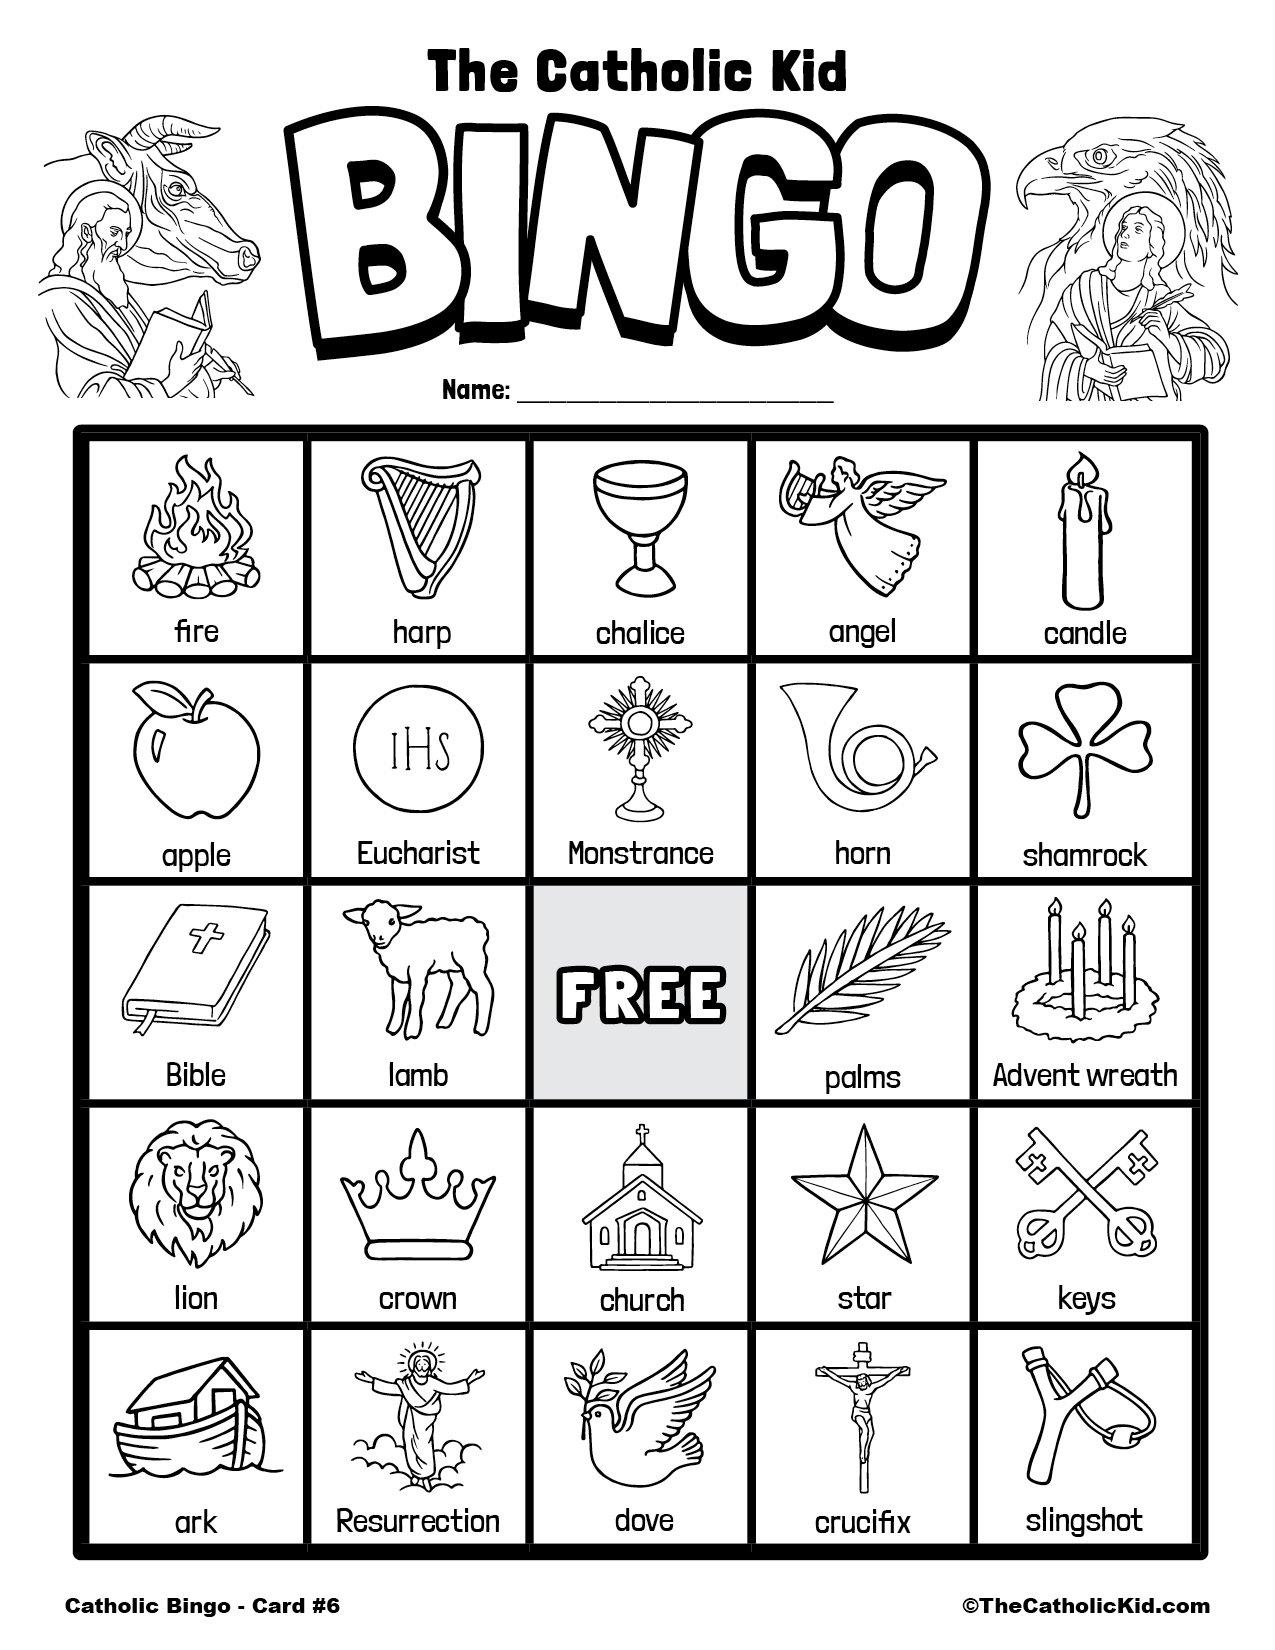 Free Printable Catholic Bingo Game Card - 6